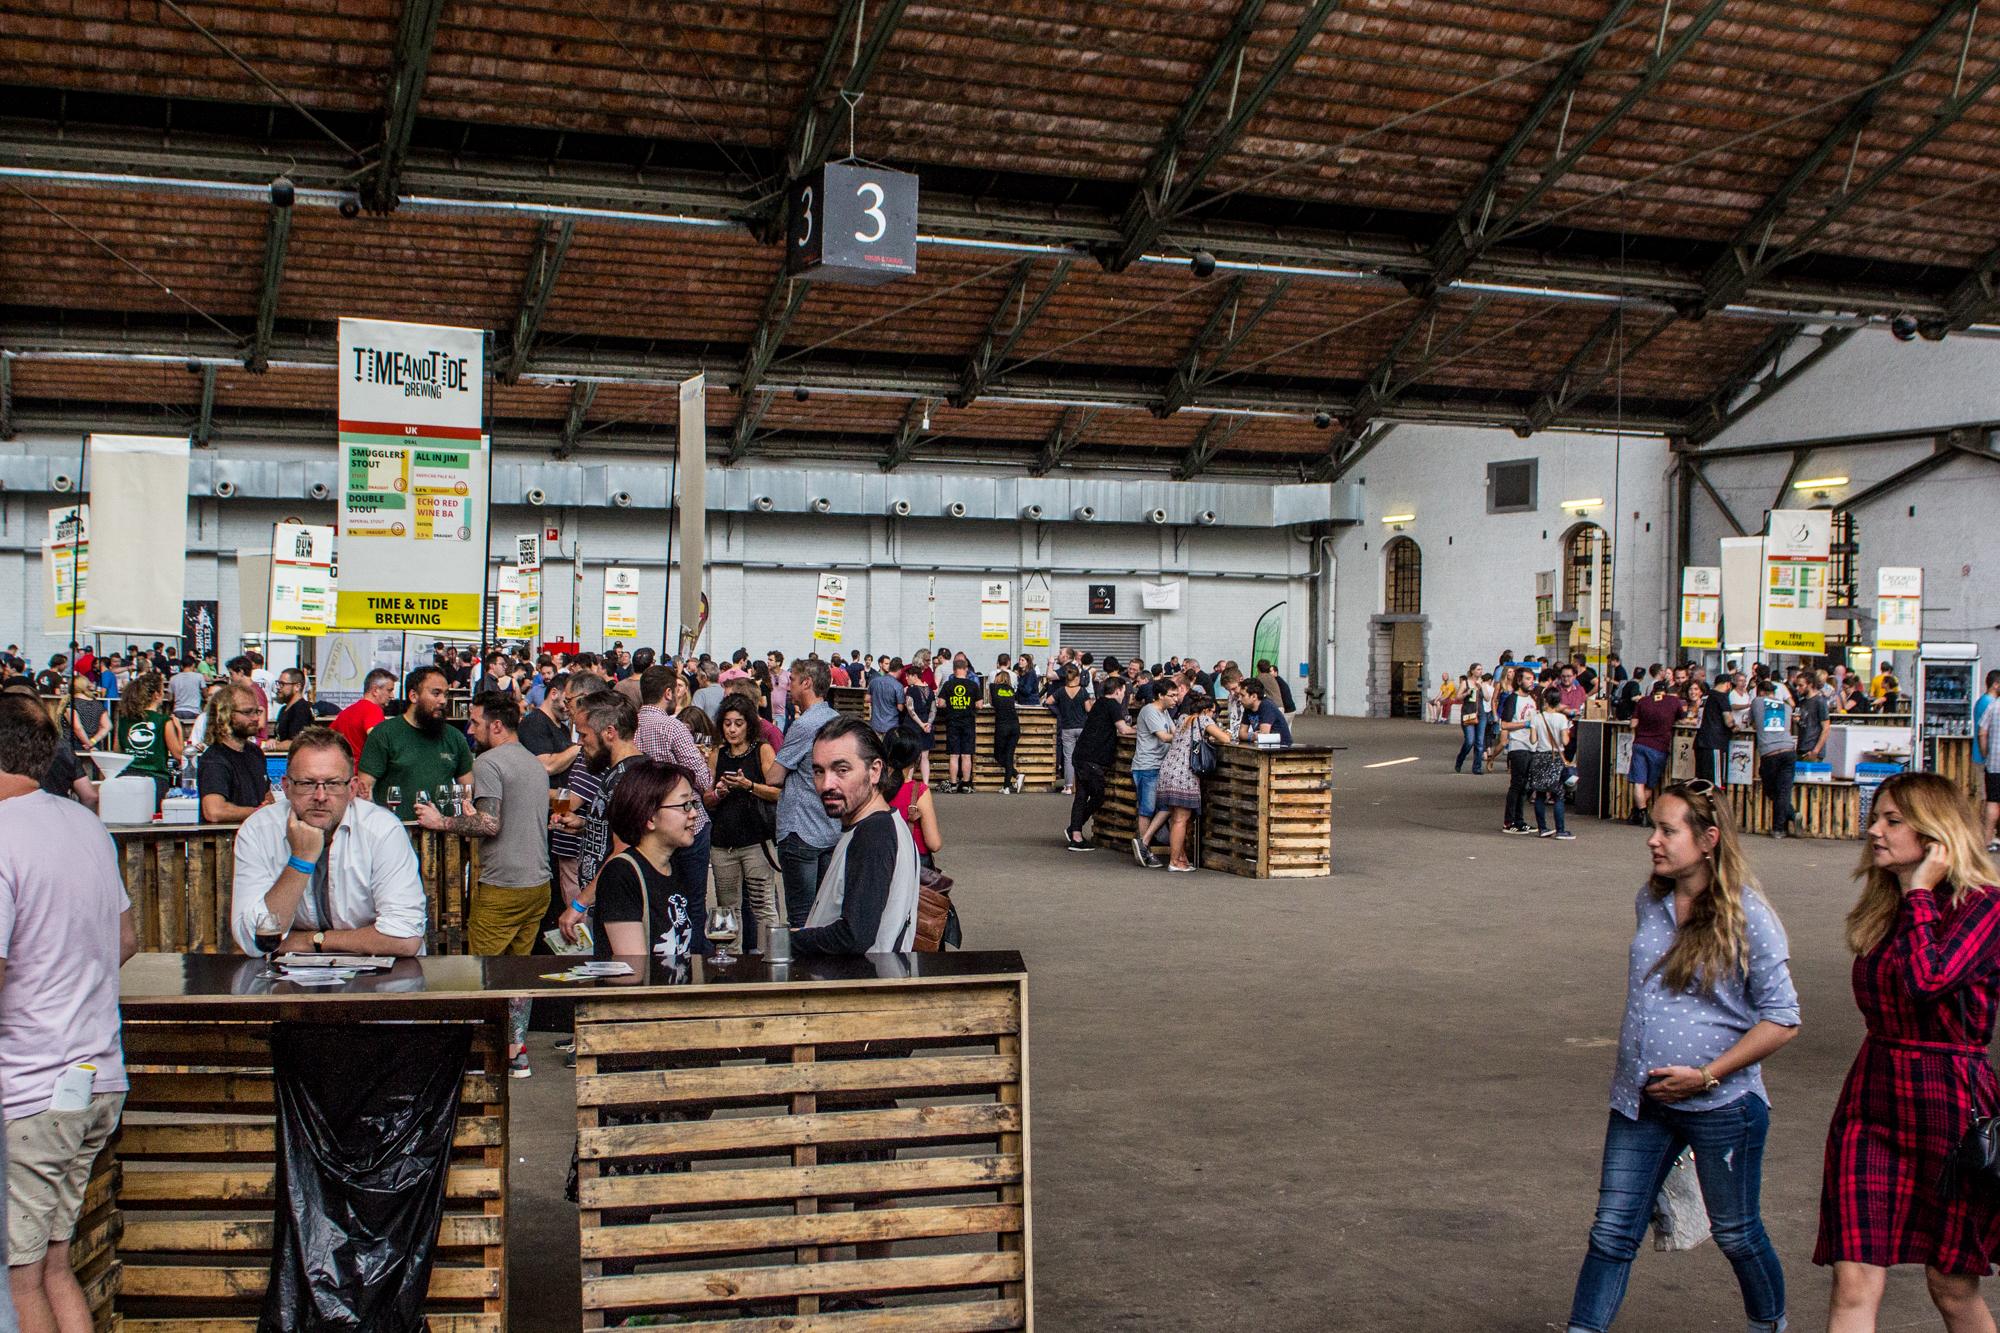 bxl beerfest (2 of 10)